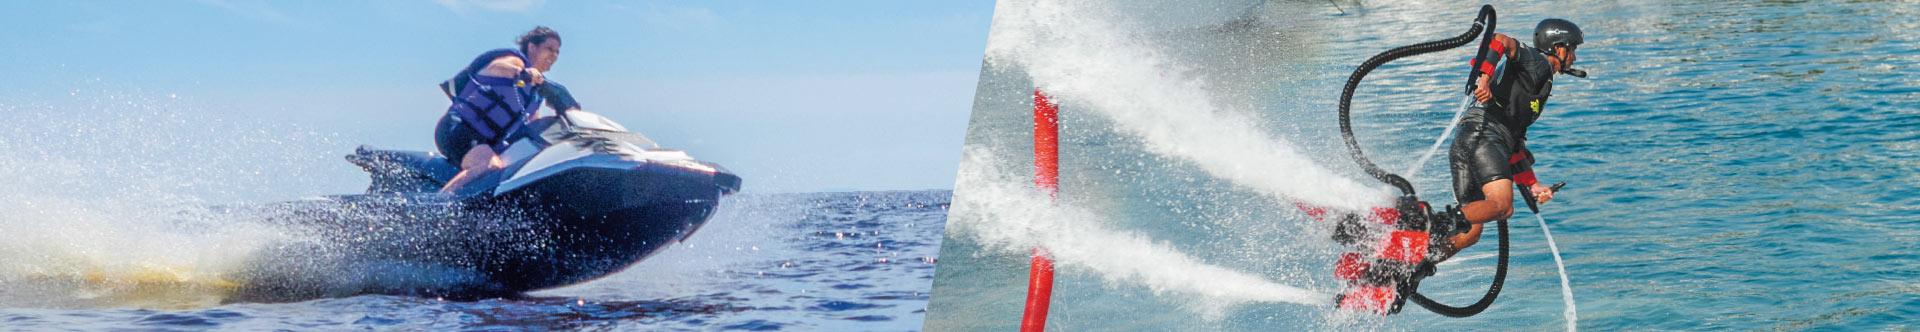 Infini Pass Flyboard et Jet Ski